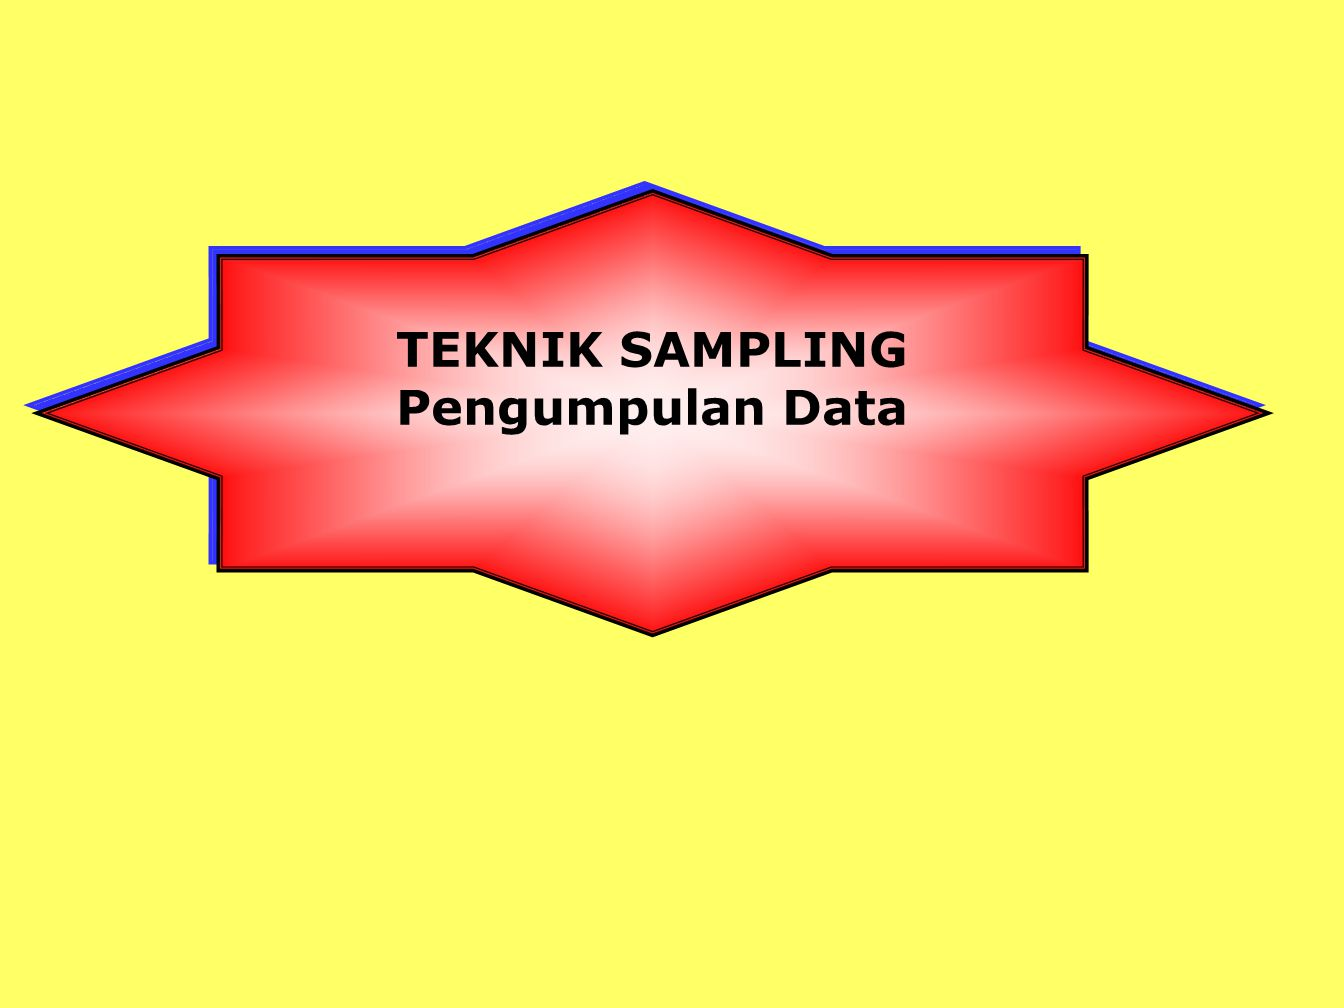 TEKNIK SAMPLING Pengumpulan Data TEKNIK SAMPLING Pengumpulan Data